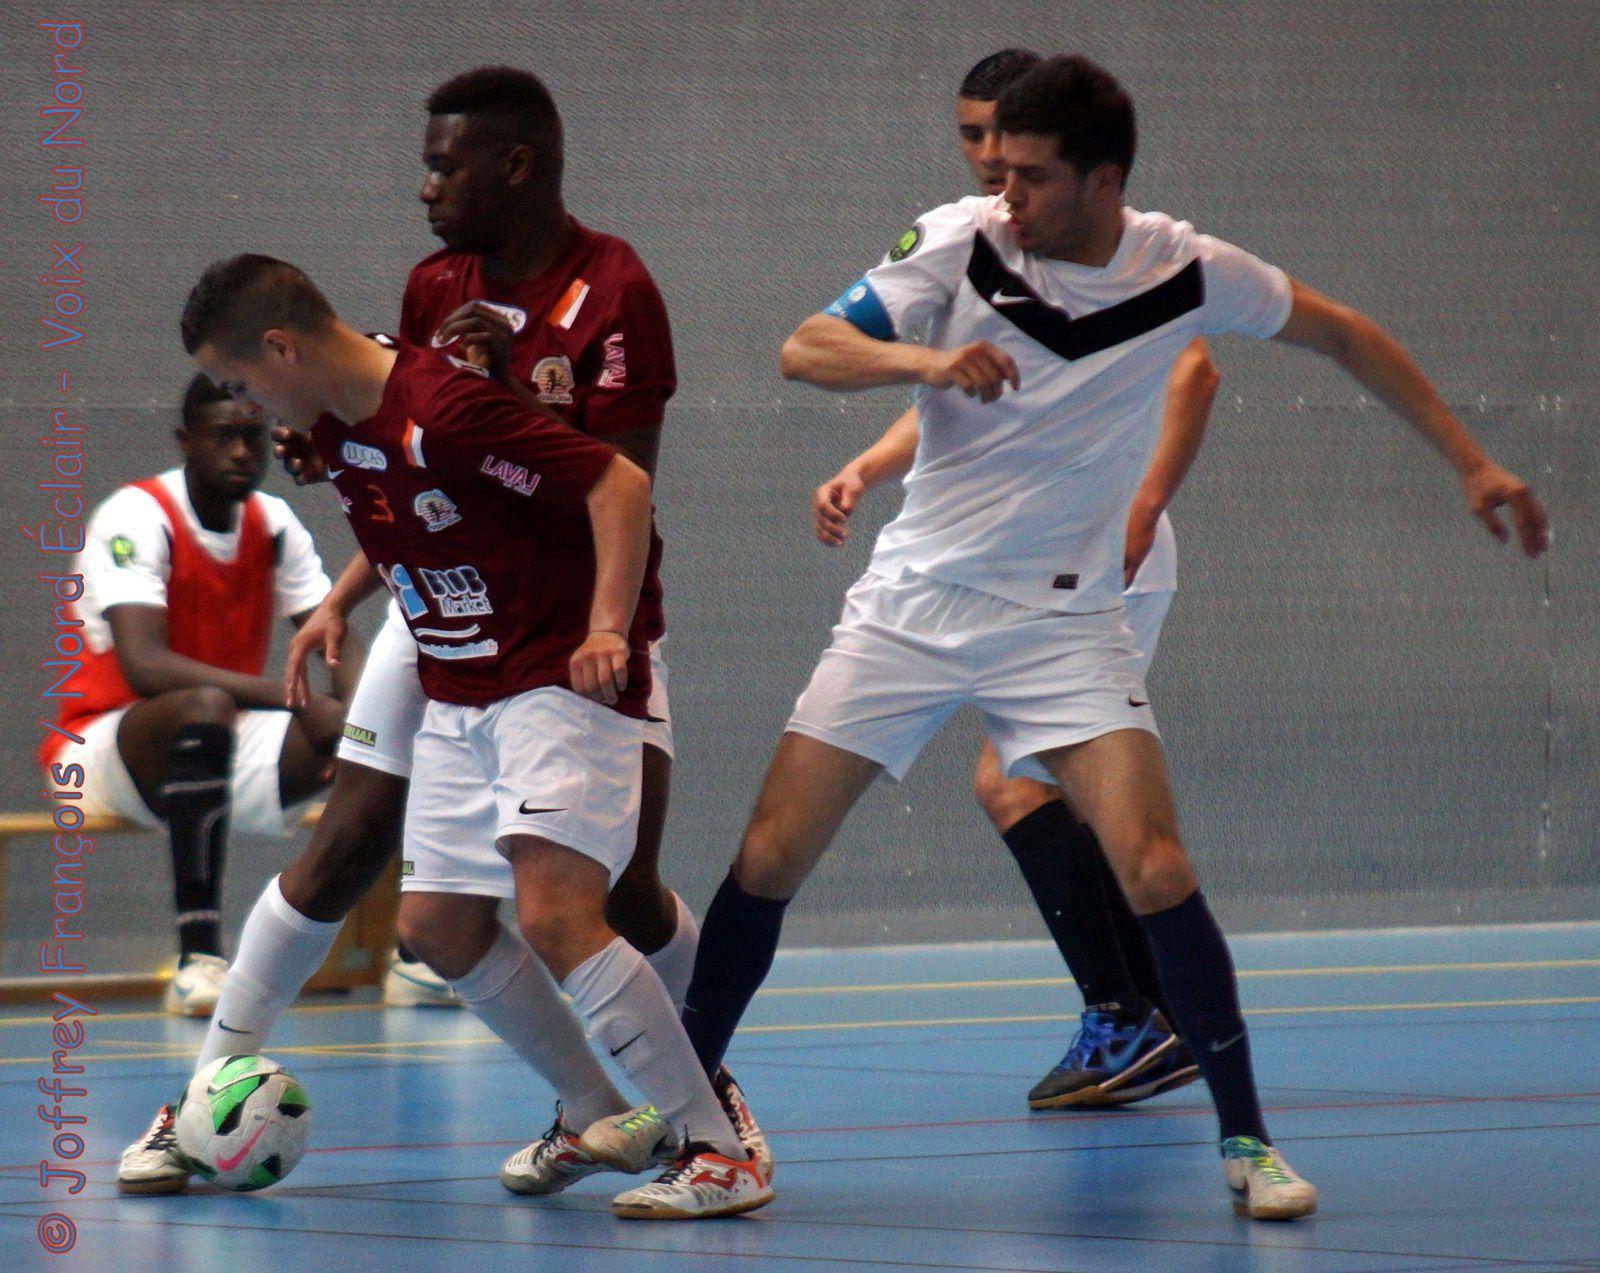 19.04.14 : DHR (USPRT-Noeux) PL (Rbx Omnisport-Wazemmes) Futsal (Rbx - Laval)